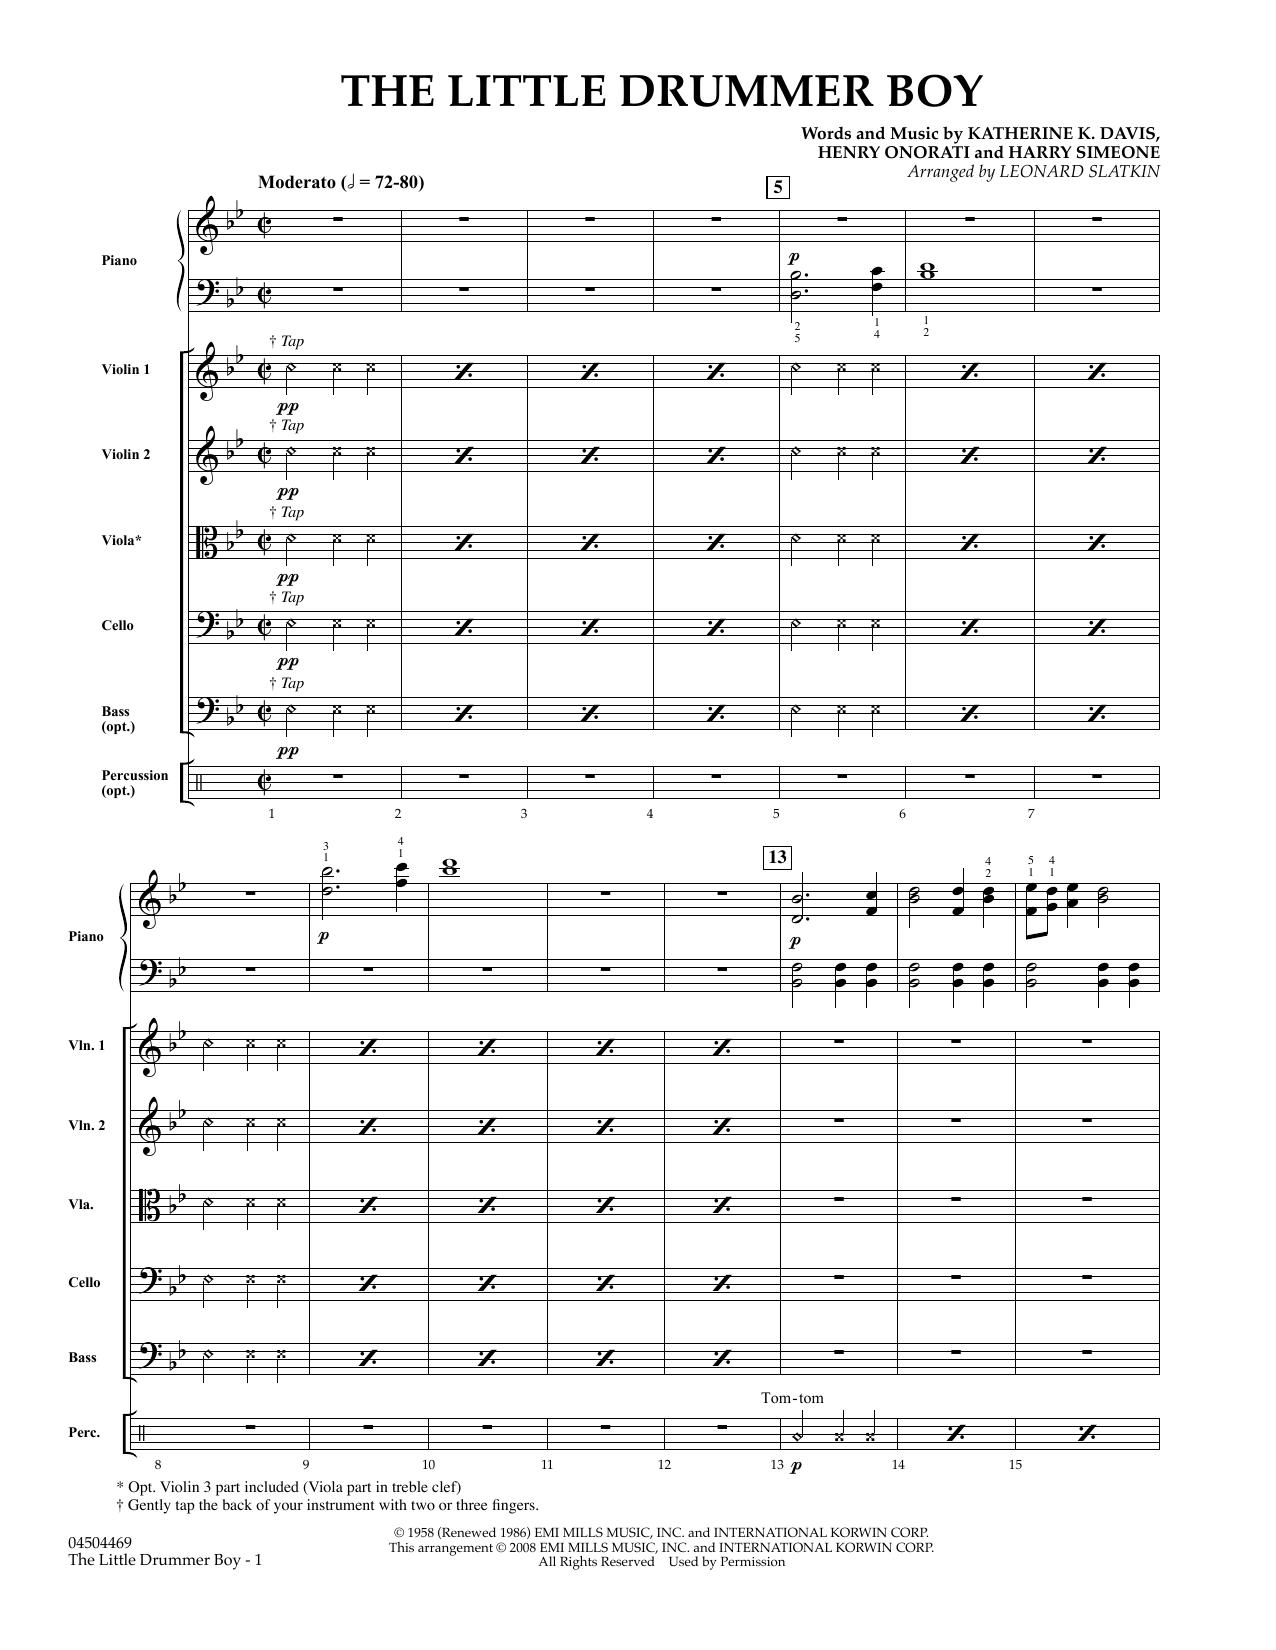 The Little Drummer Boy - Conductor Score (Full Score) sheet music